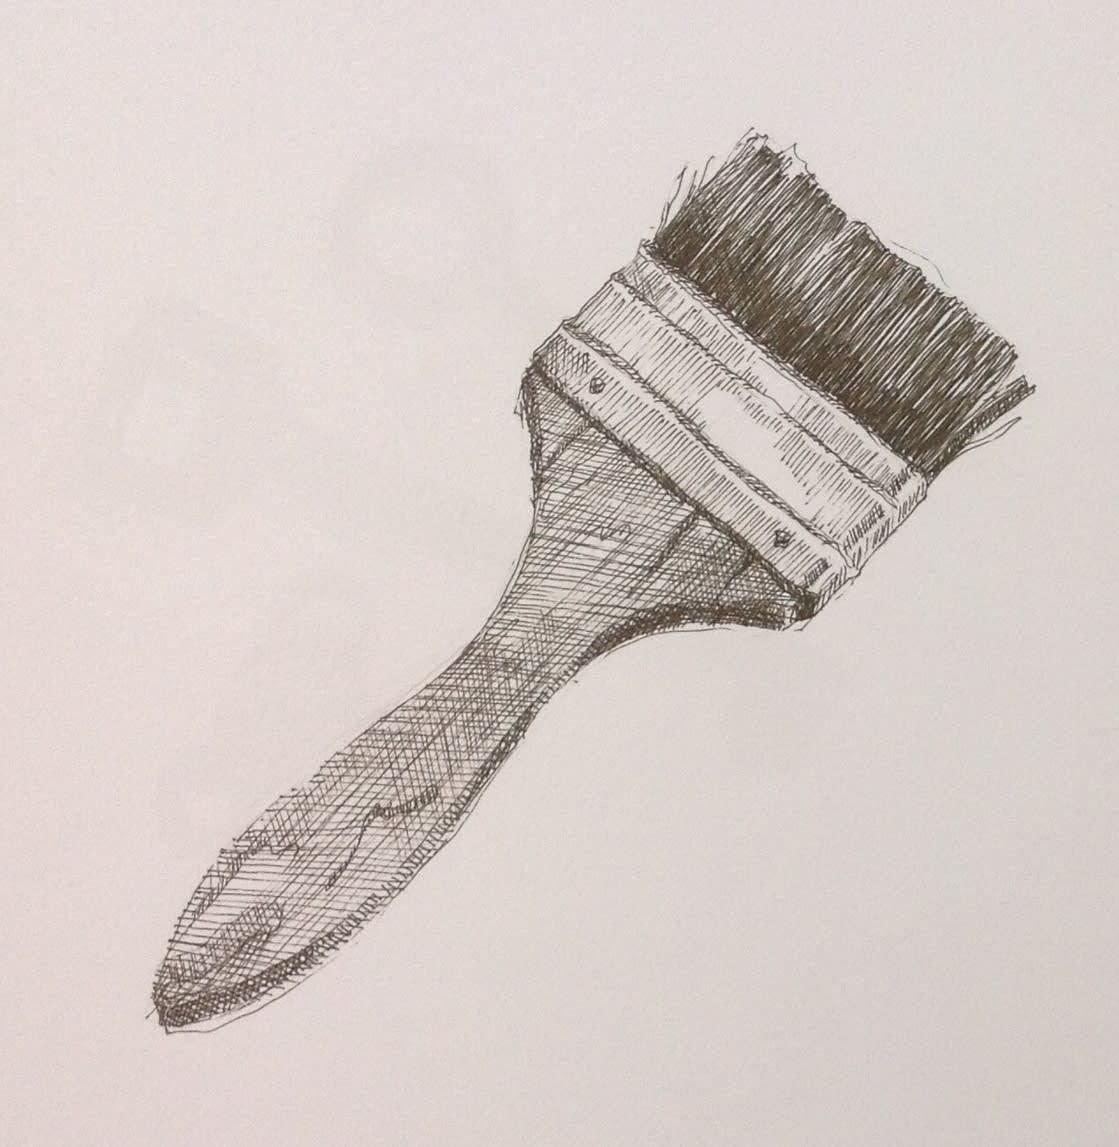 <span class=&#34;link fancybox-details-link&#34;><a href=&#34;/content/viewing-room/58/artworks2425/&#34;>View Detail Page</a></span><div class=&#34;medium&#34;>Ink On Paper</div> <div class=&#34;dimensions&#34;>30cm x 25cm</div>